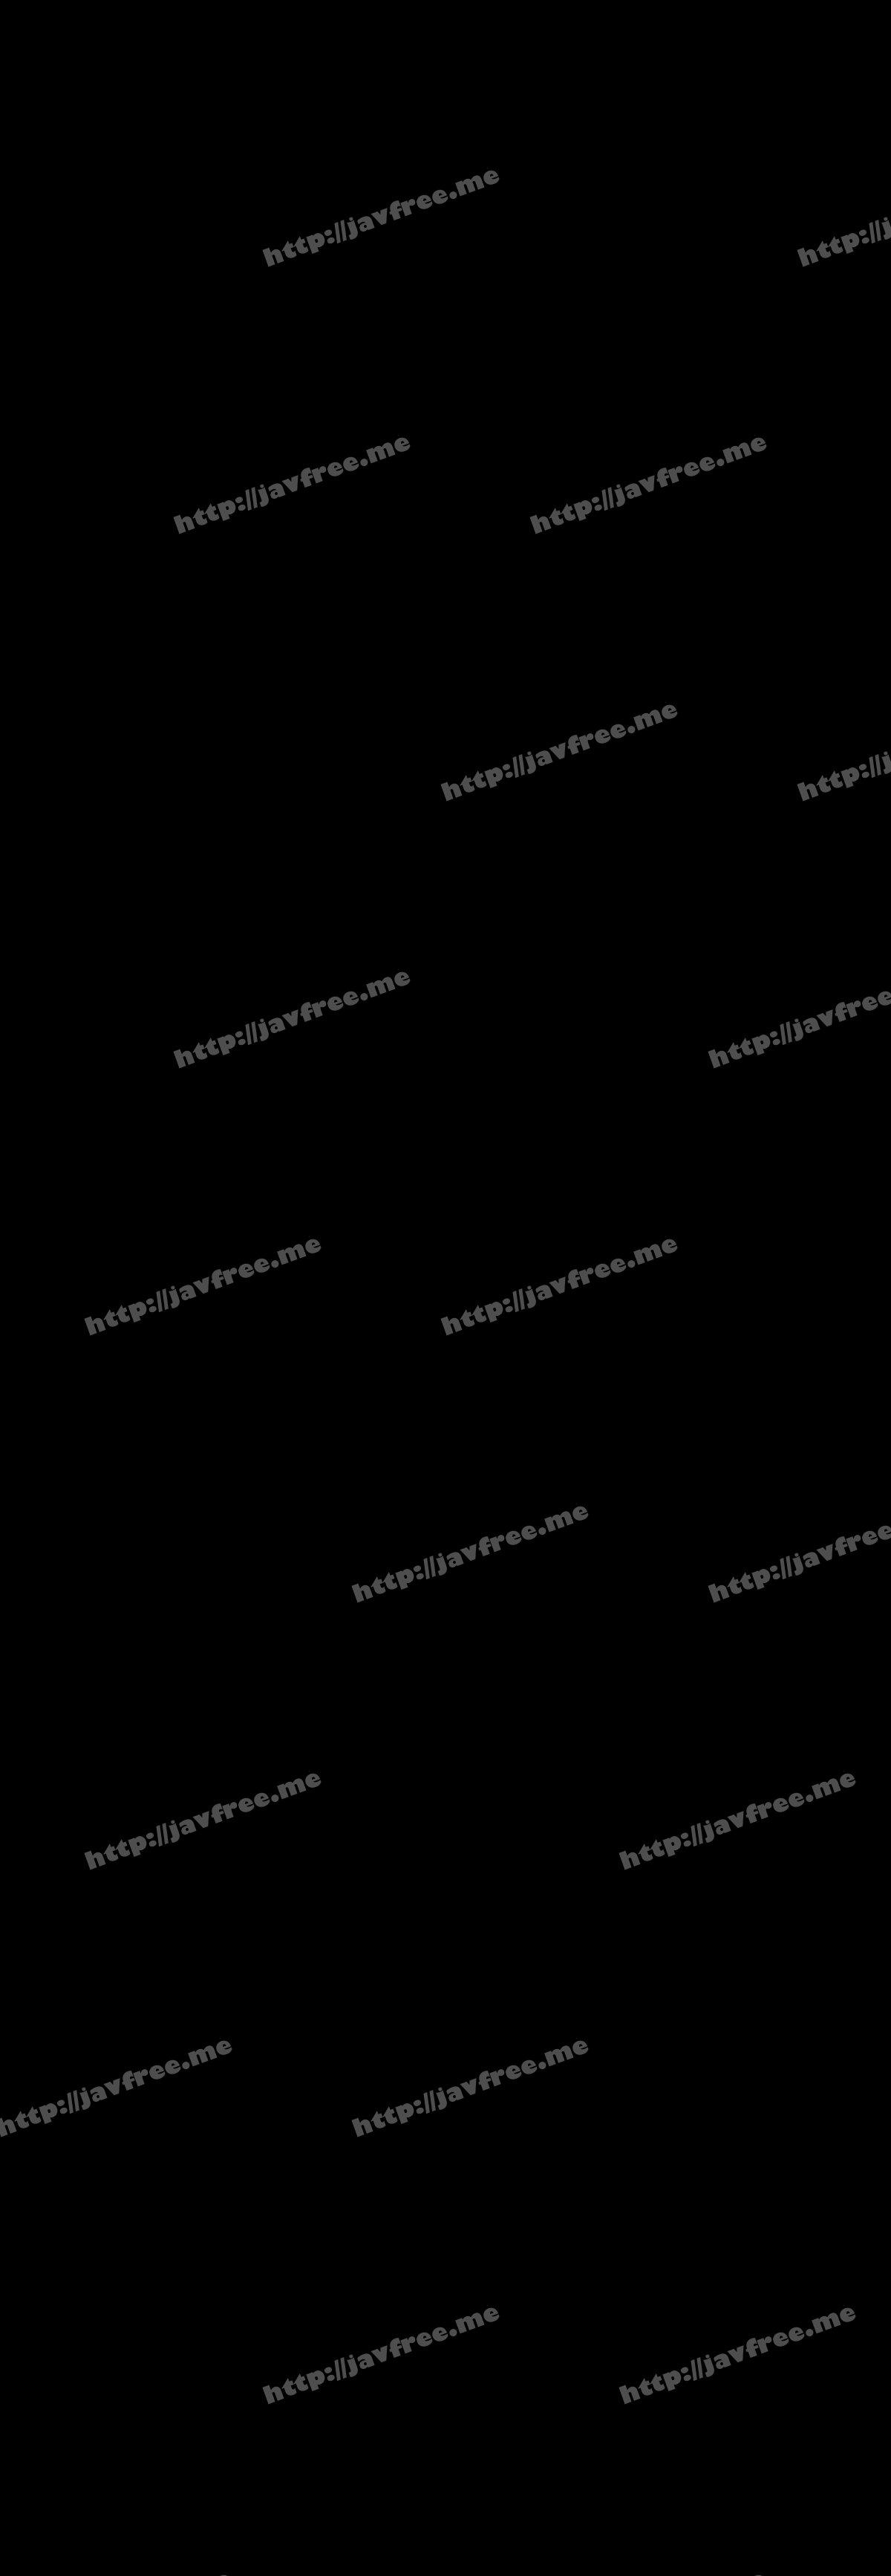 [HD][OKAX-535] パンティーが好きなの?それともおま○こ?お姉さんの成熟した股間を包むパンティーの中を想像しながらドピュ! - image OKAX-535-720p on https://javfree.me